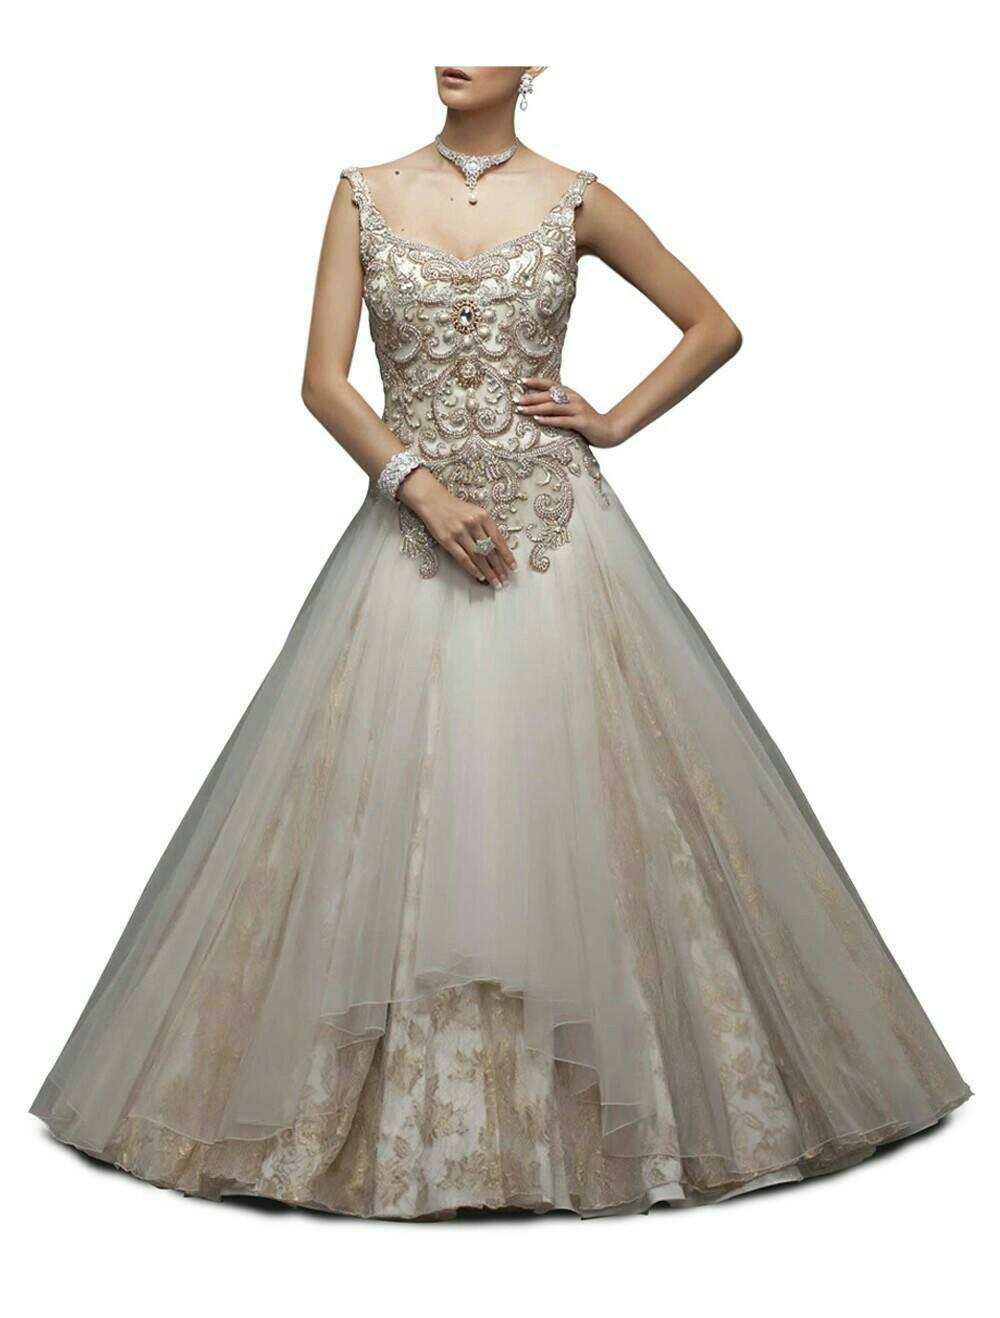 Purnima Exports - Bridal & Evening Wear Manufacturer